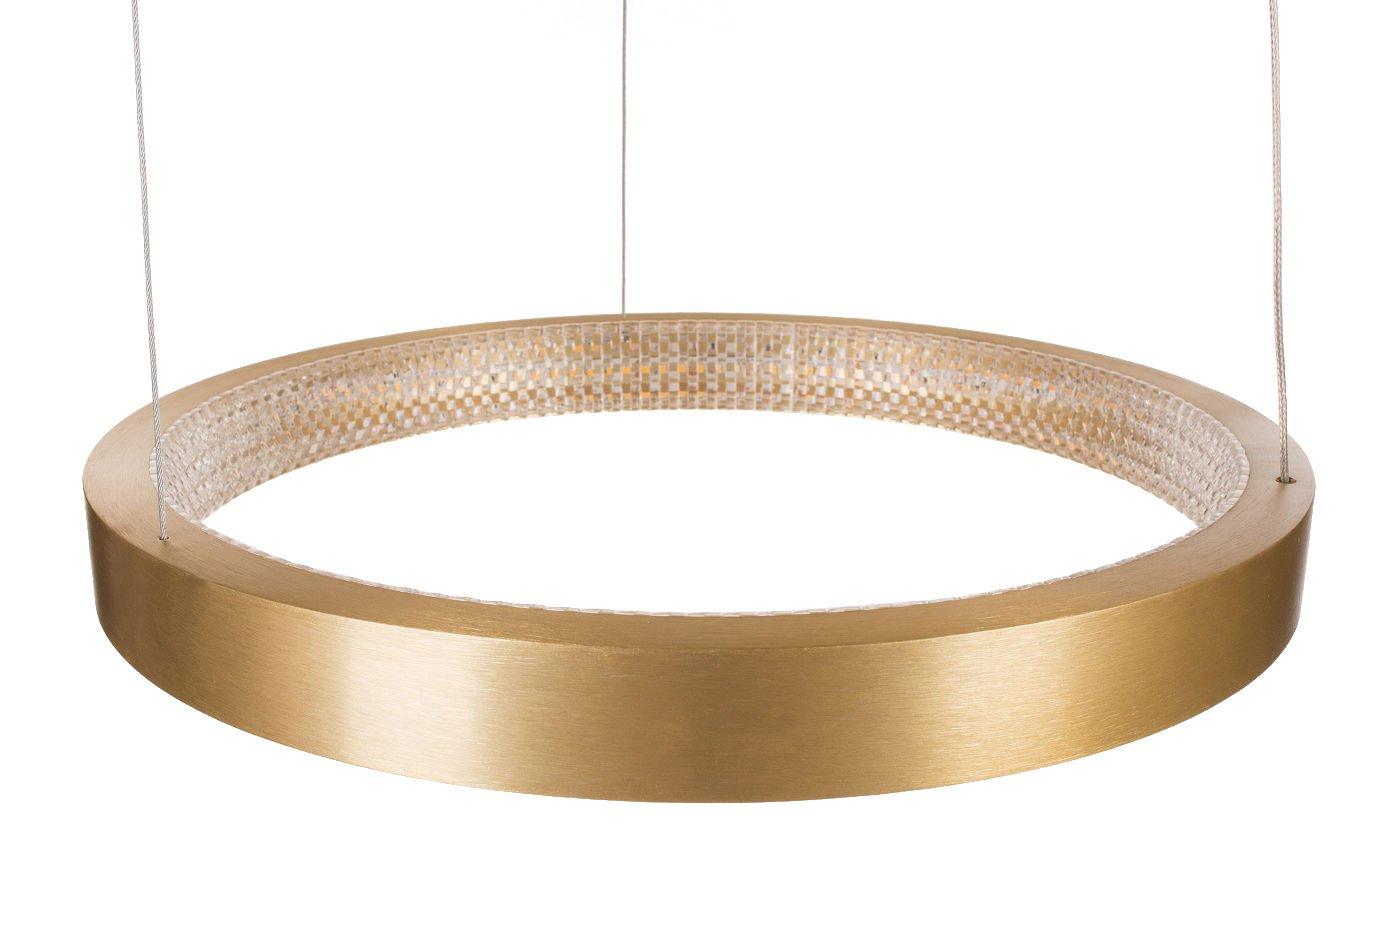 Lampa Wisząca Okrągła Led Tars 1000 Model A